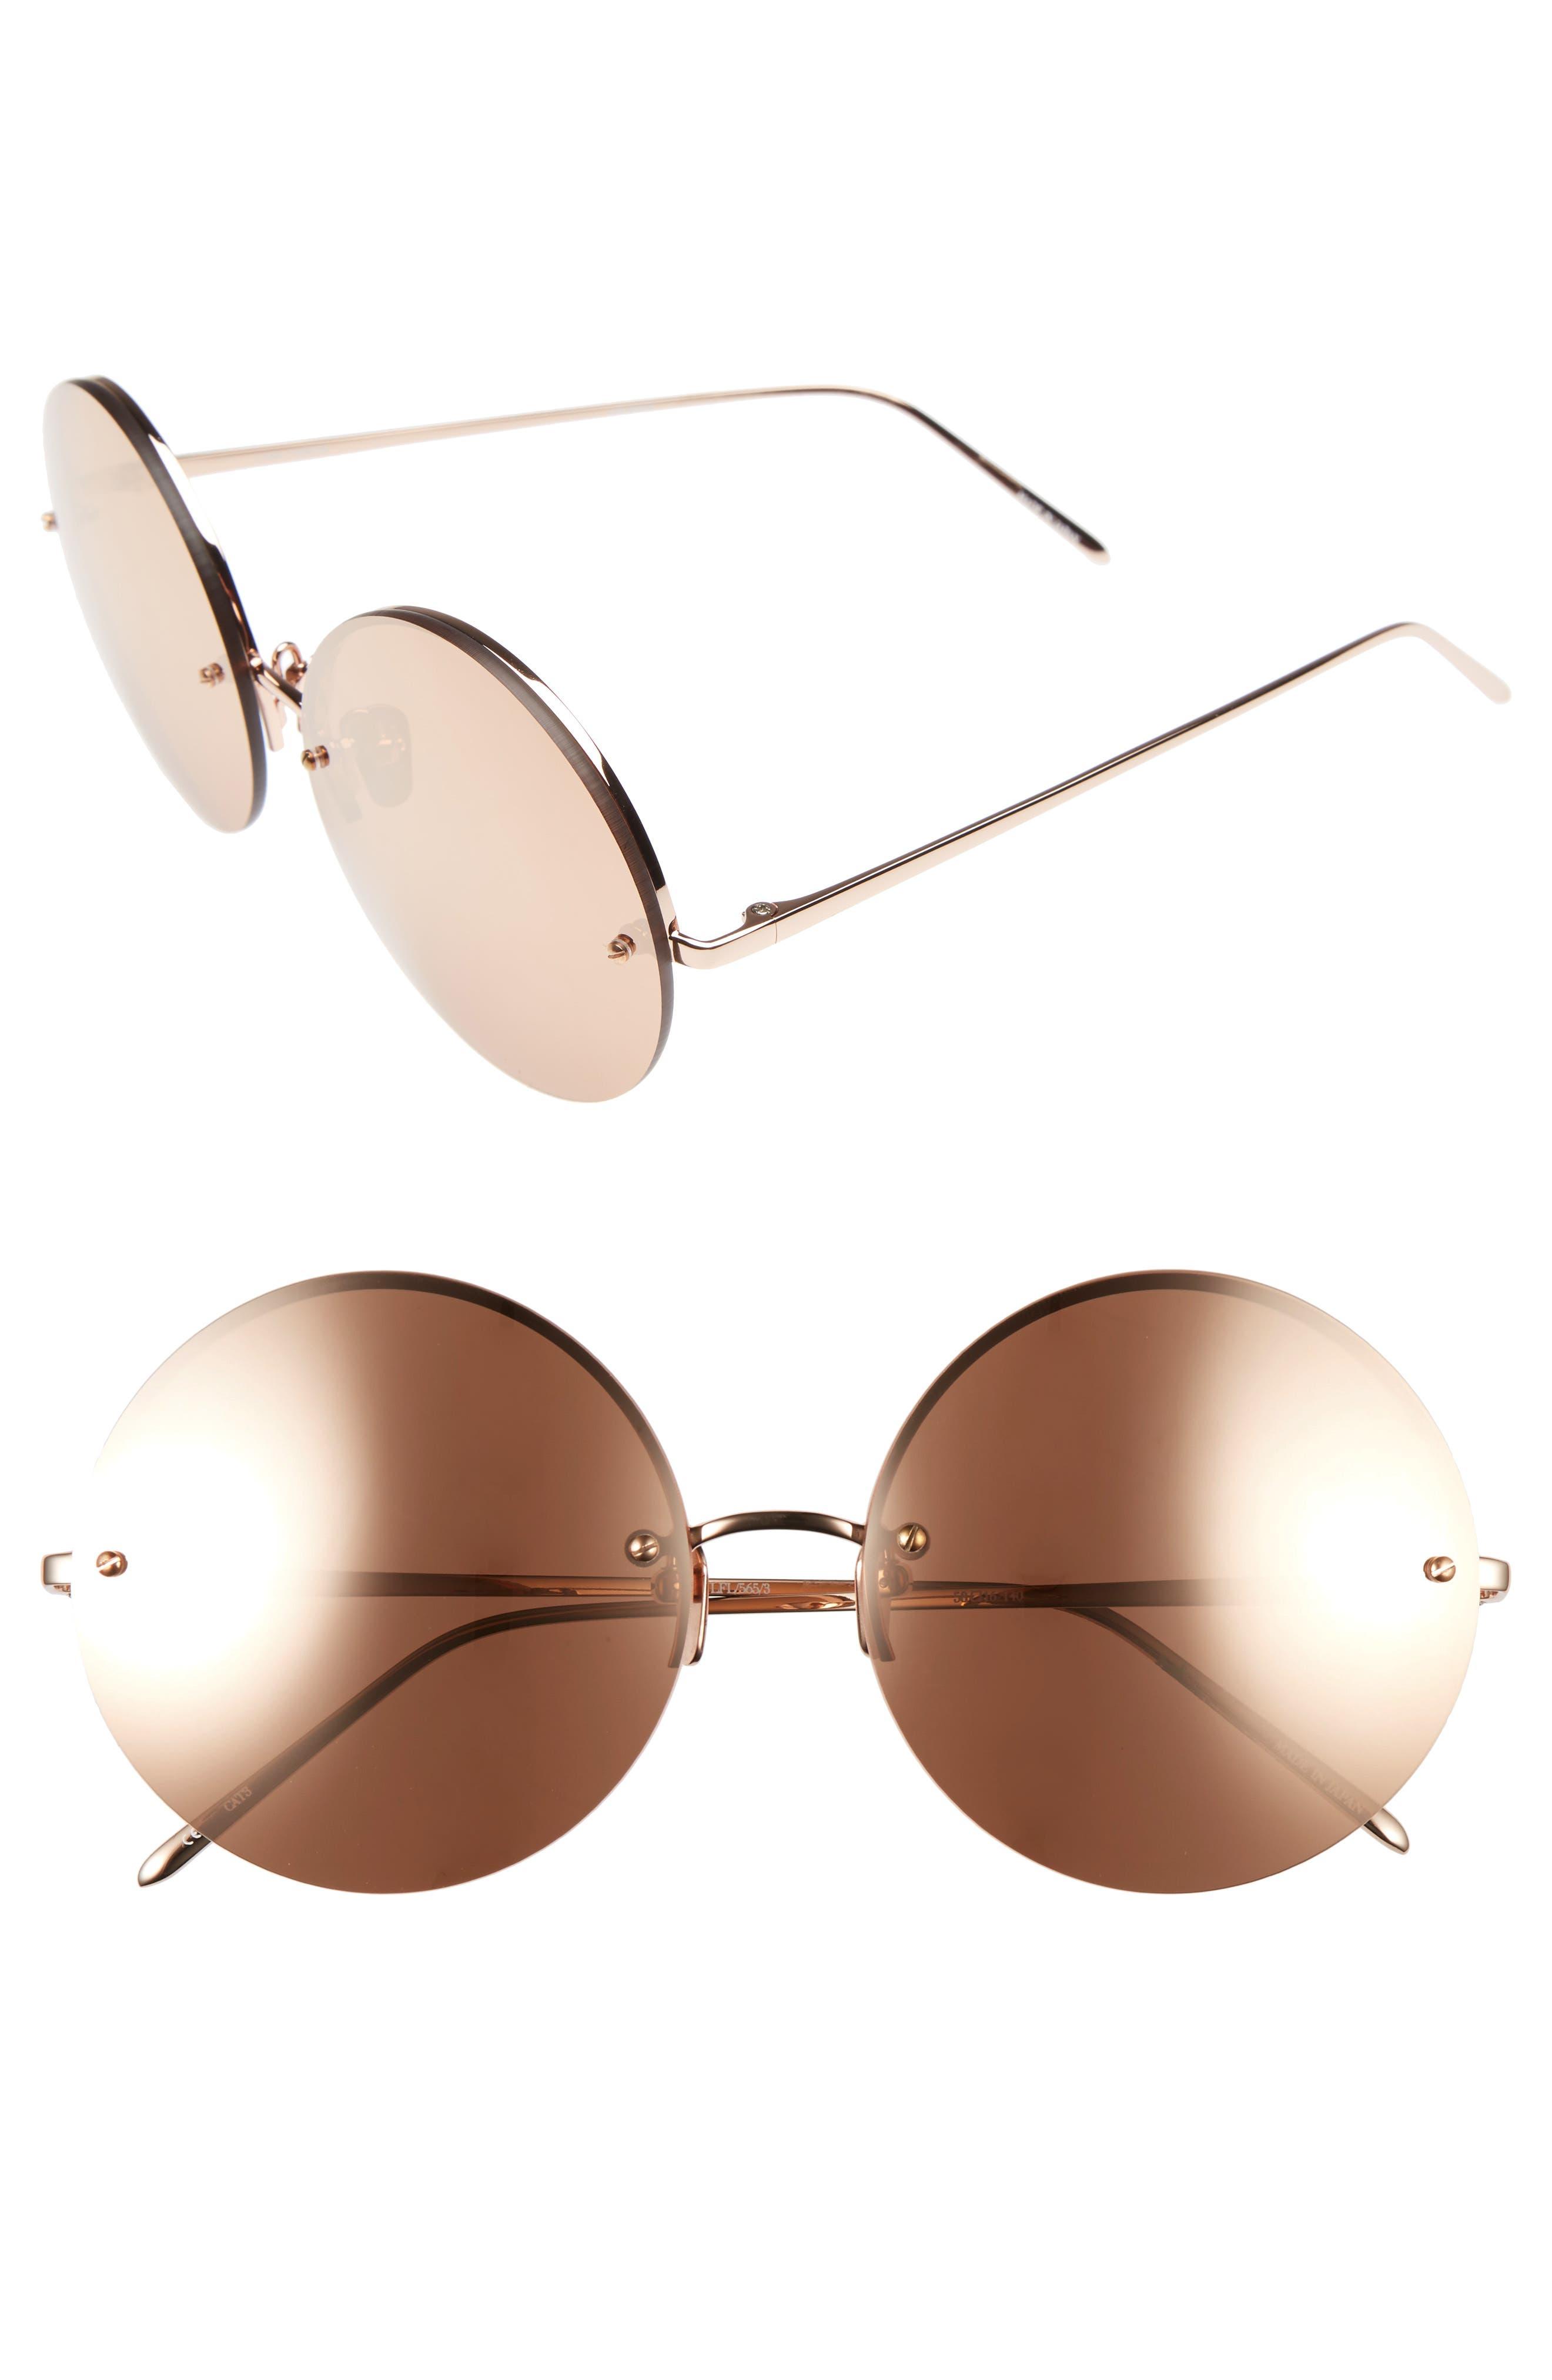 58mm 22 Karat Gold Trim Rimless Round Sunglasses,                             Main thumbnail 2, color,